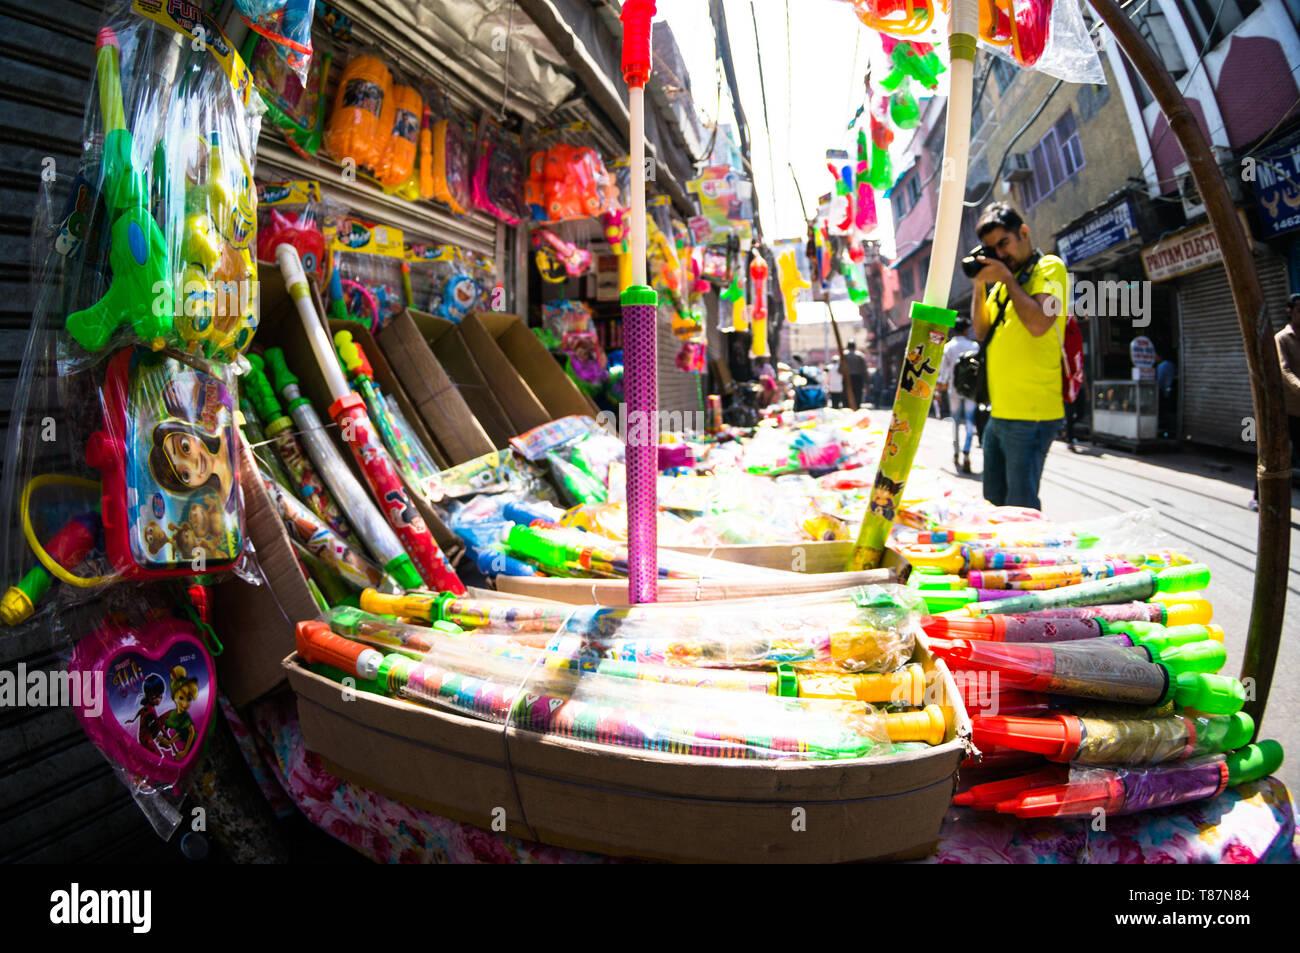 fisheye shot of a vendor selling holi supplies like water guns and colors - Stock Image